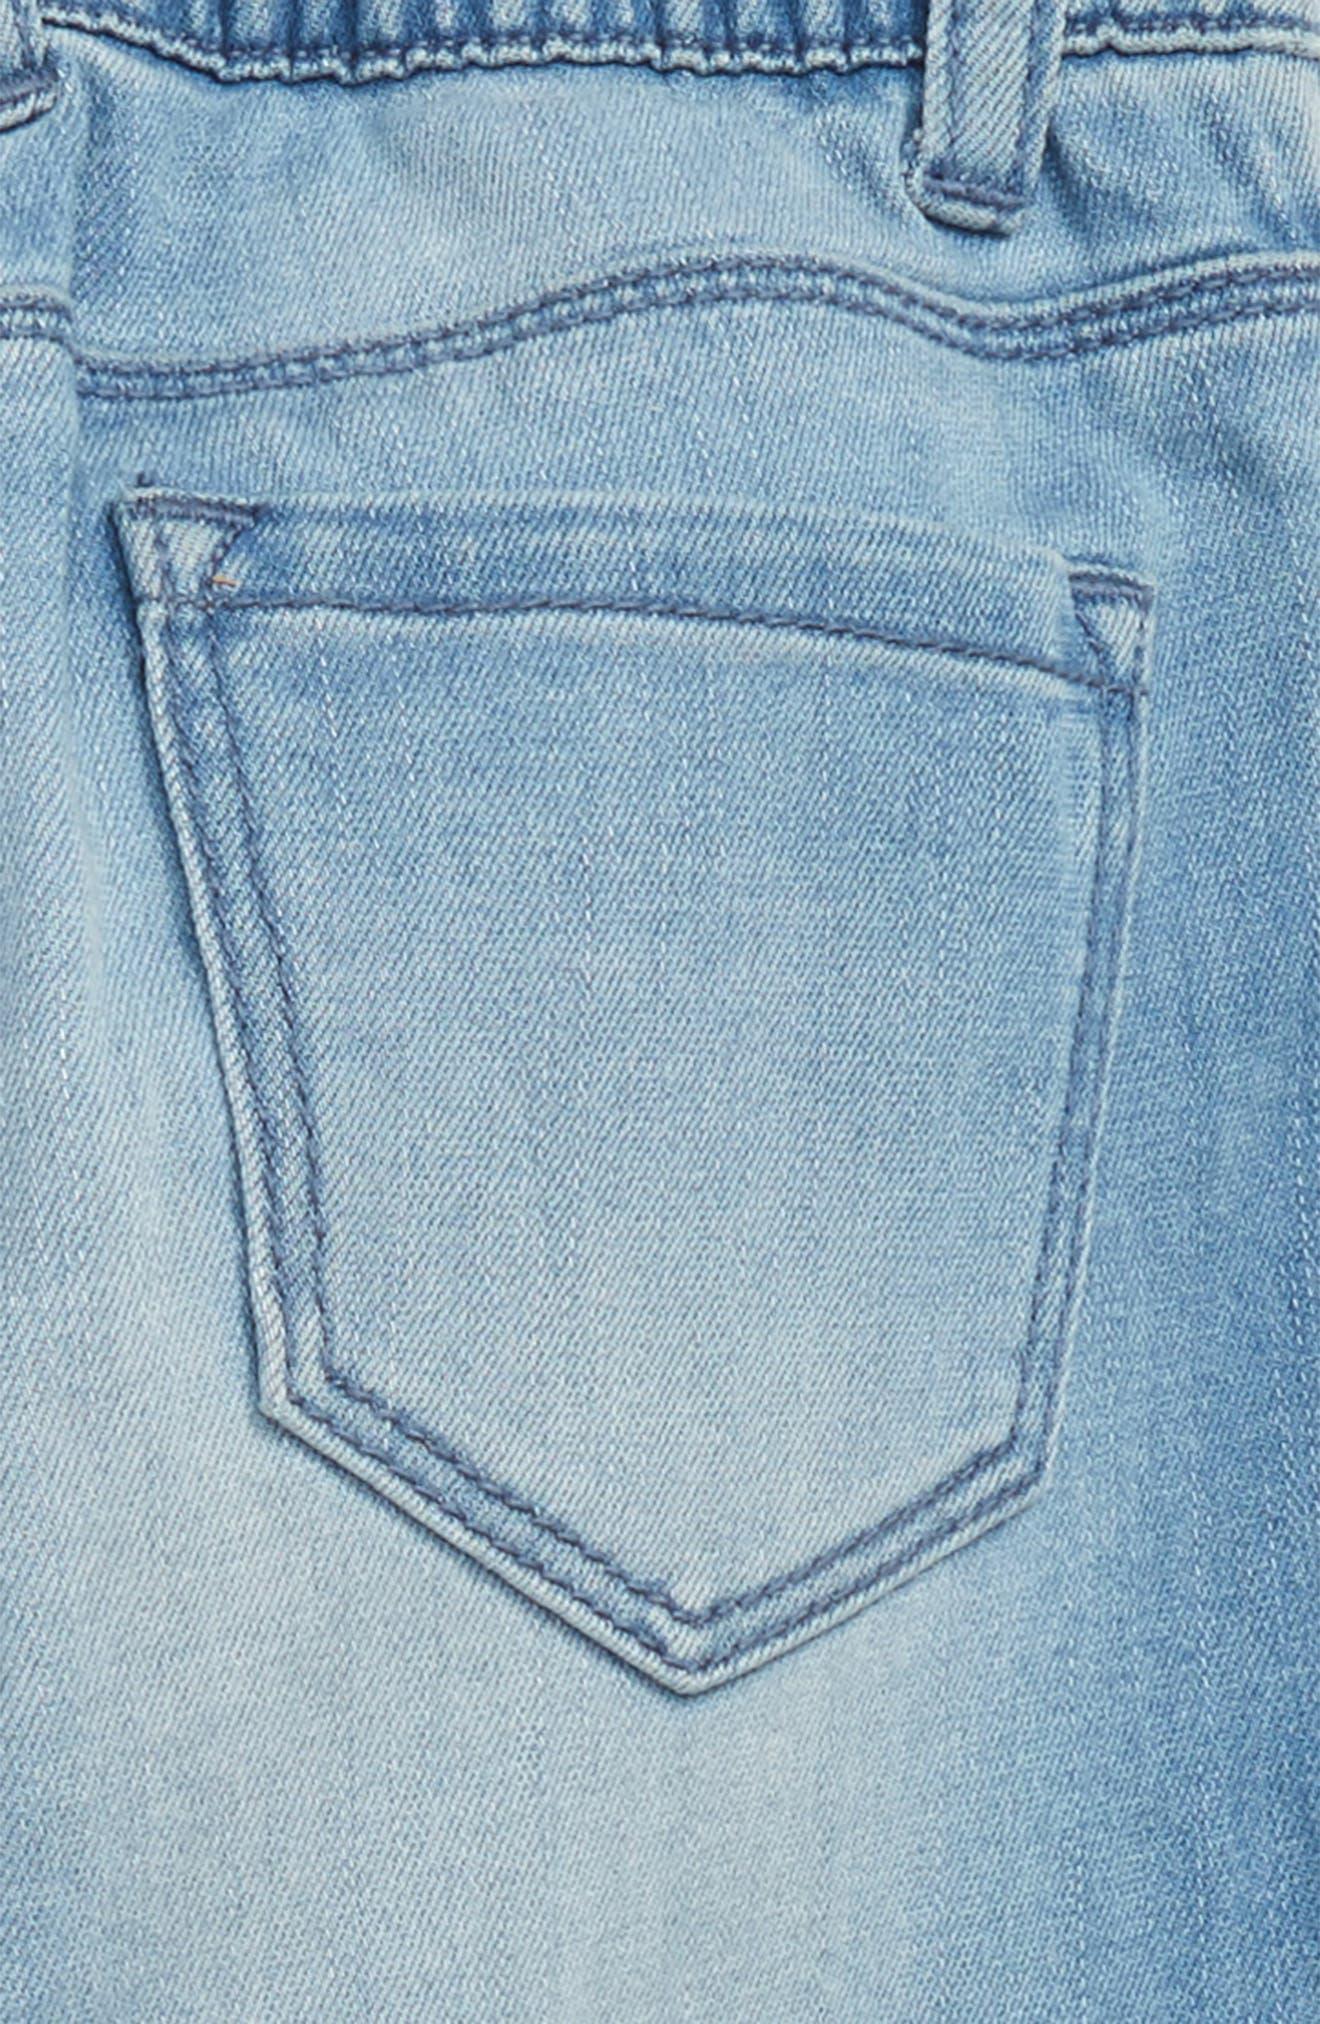 Ruffle Jeans,                             Alternate thumbnail 3, color,                             RUFFLE SKY WASH